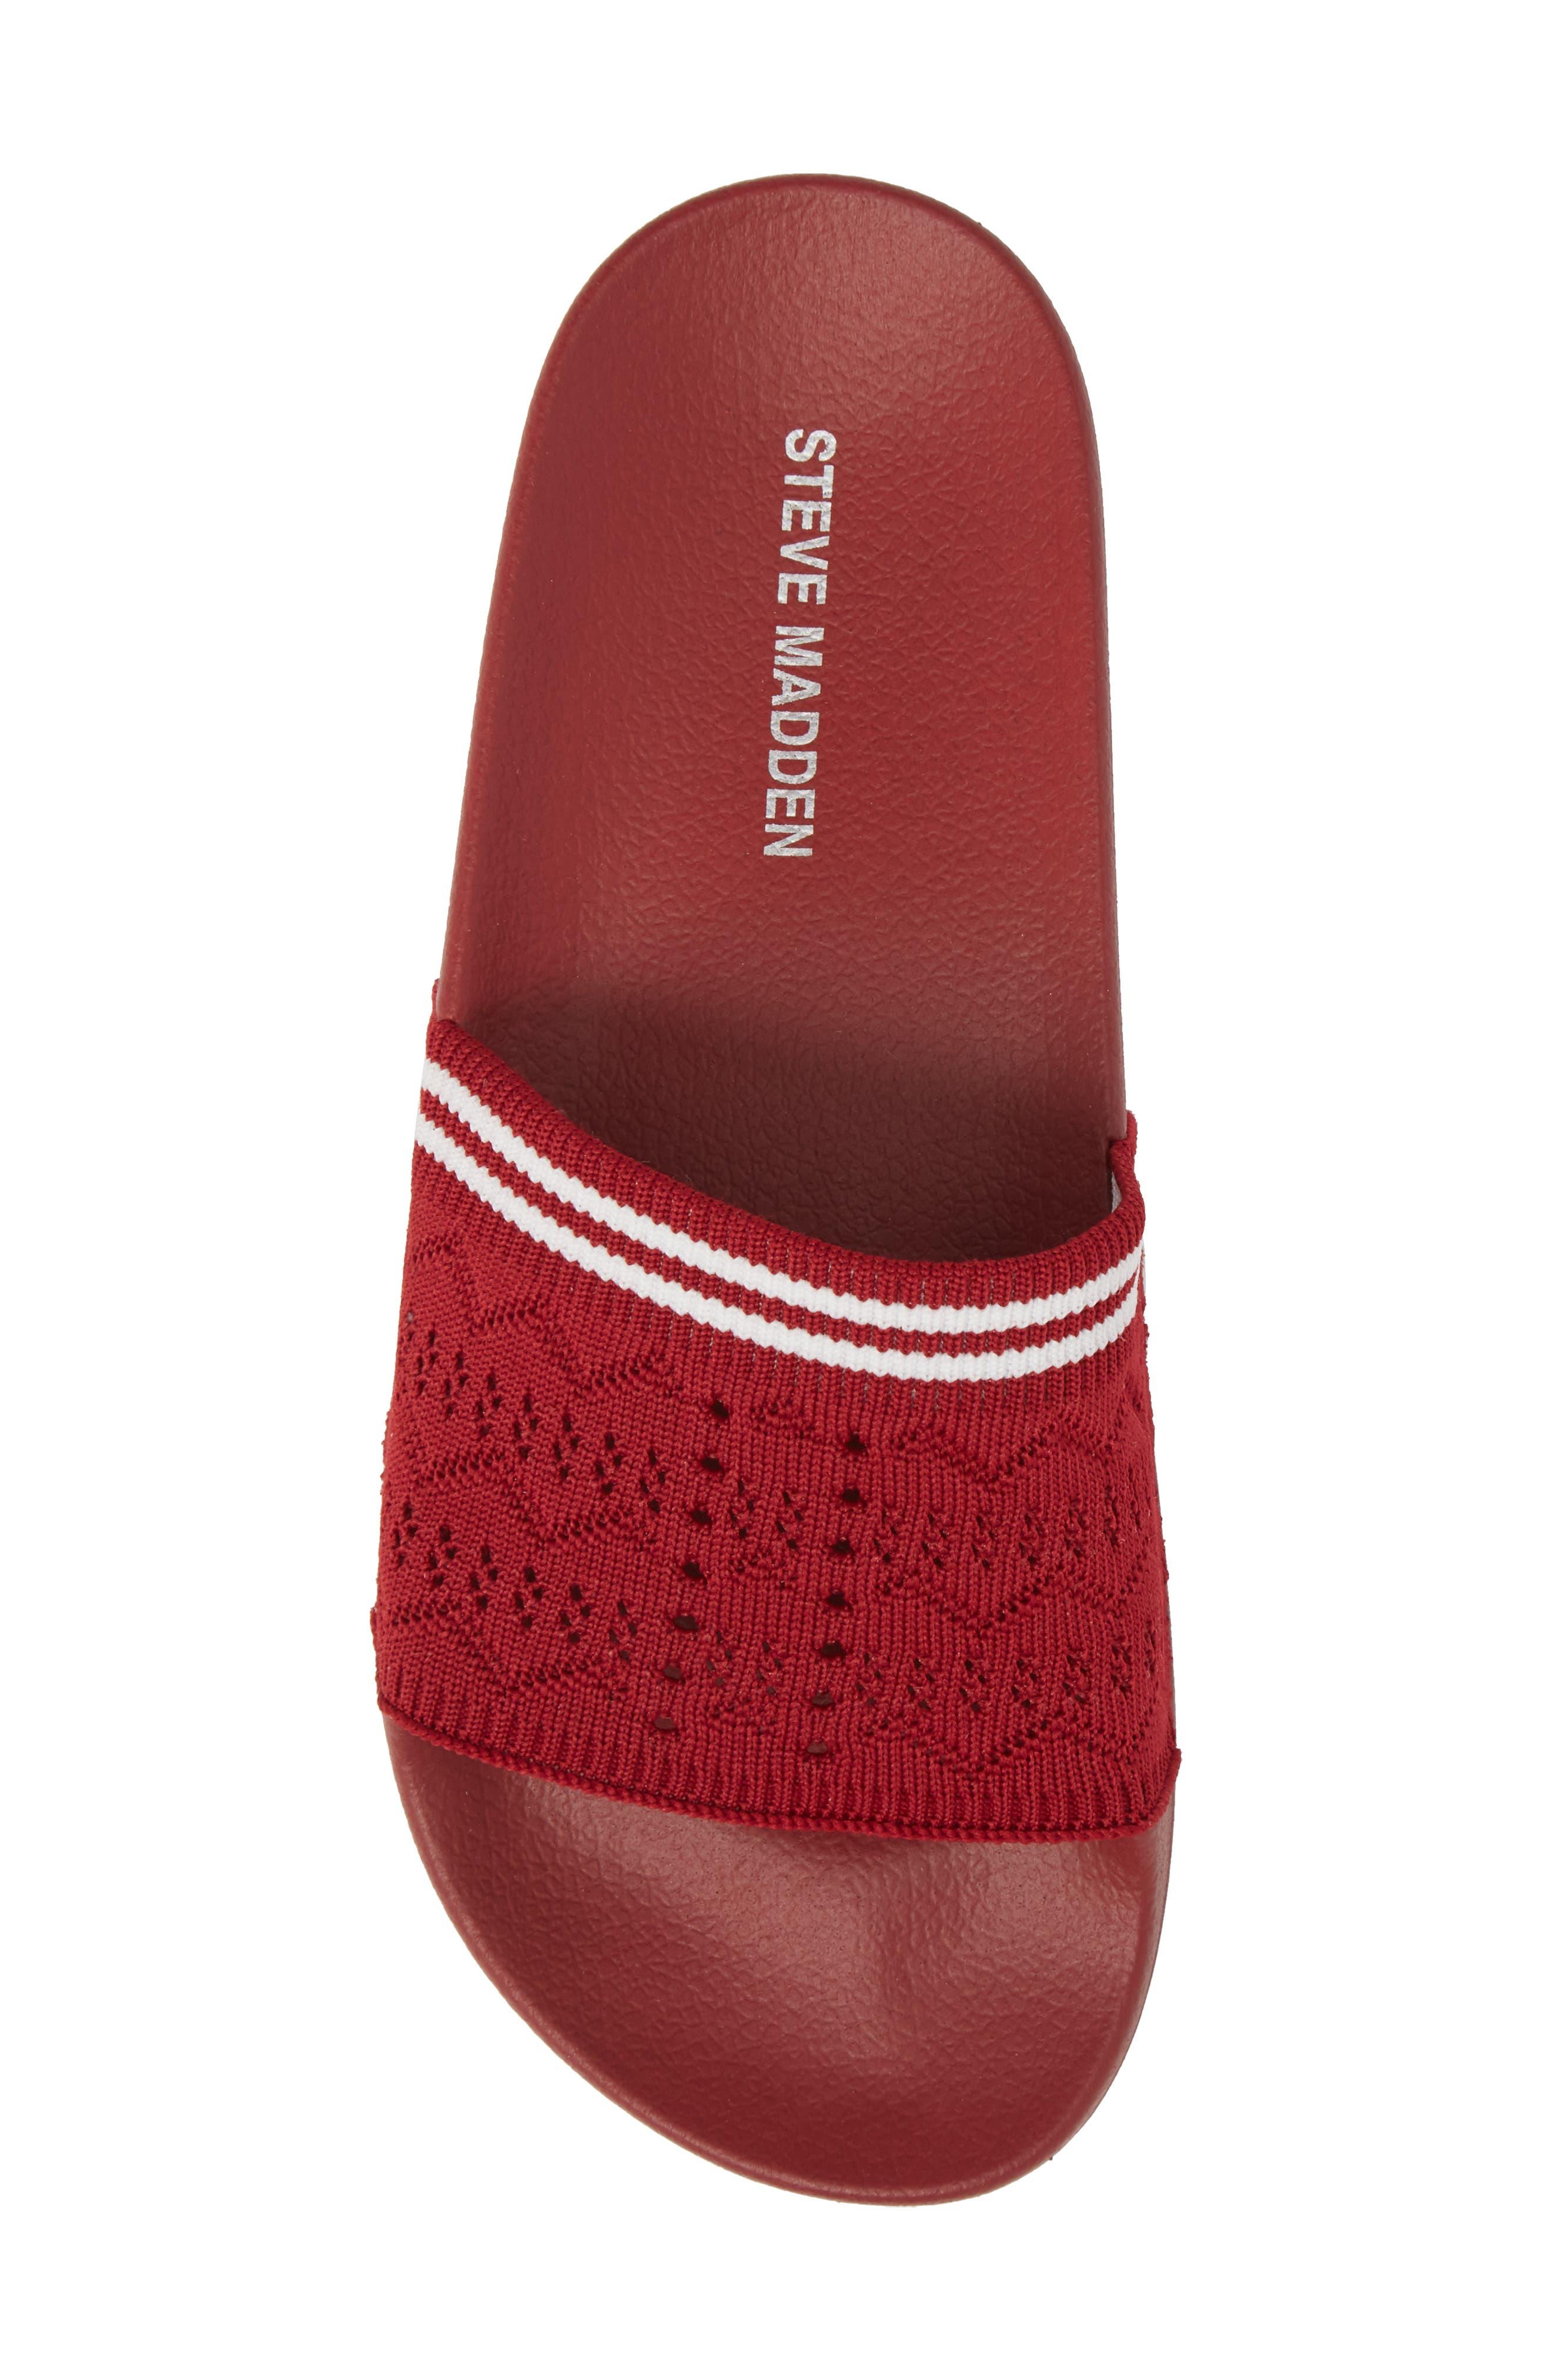 Vibe Sock Knit Slide Sandal,                             Alternate thumbnail 24, color,